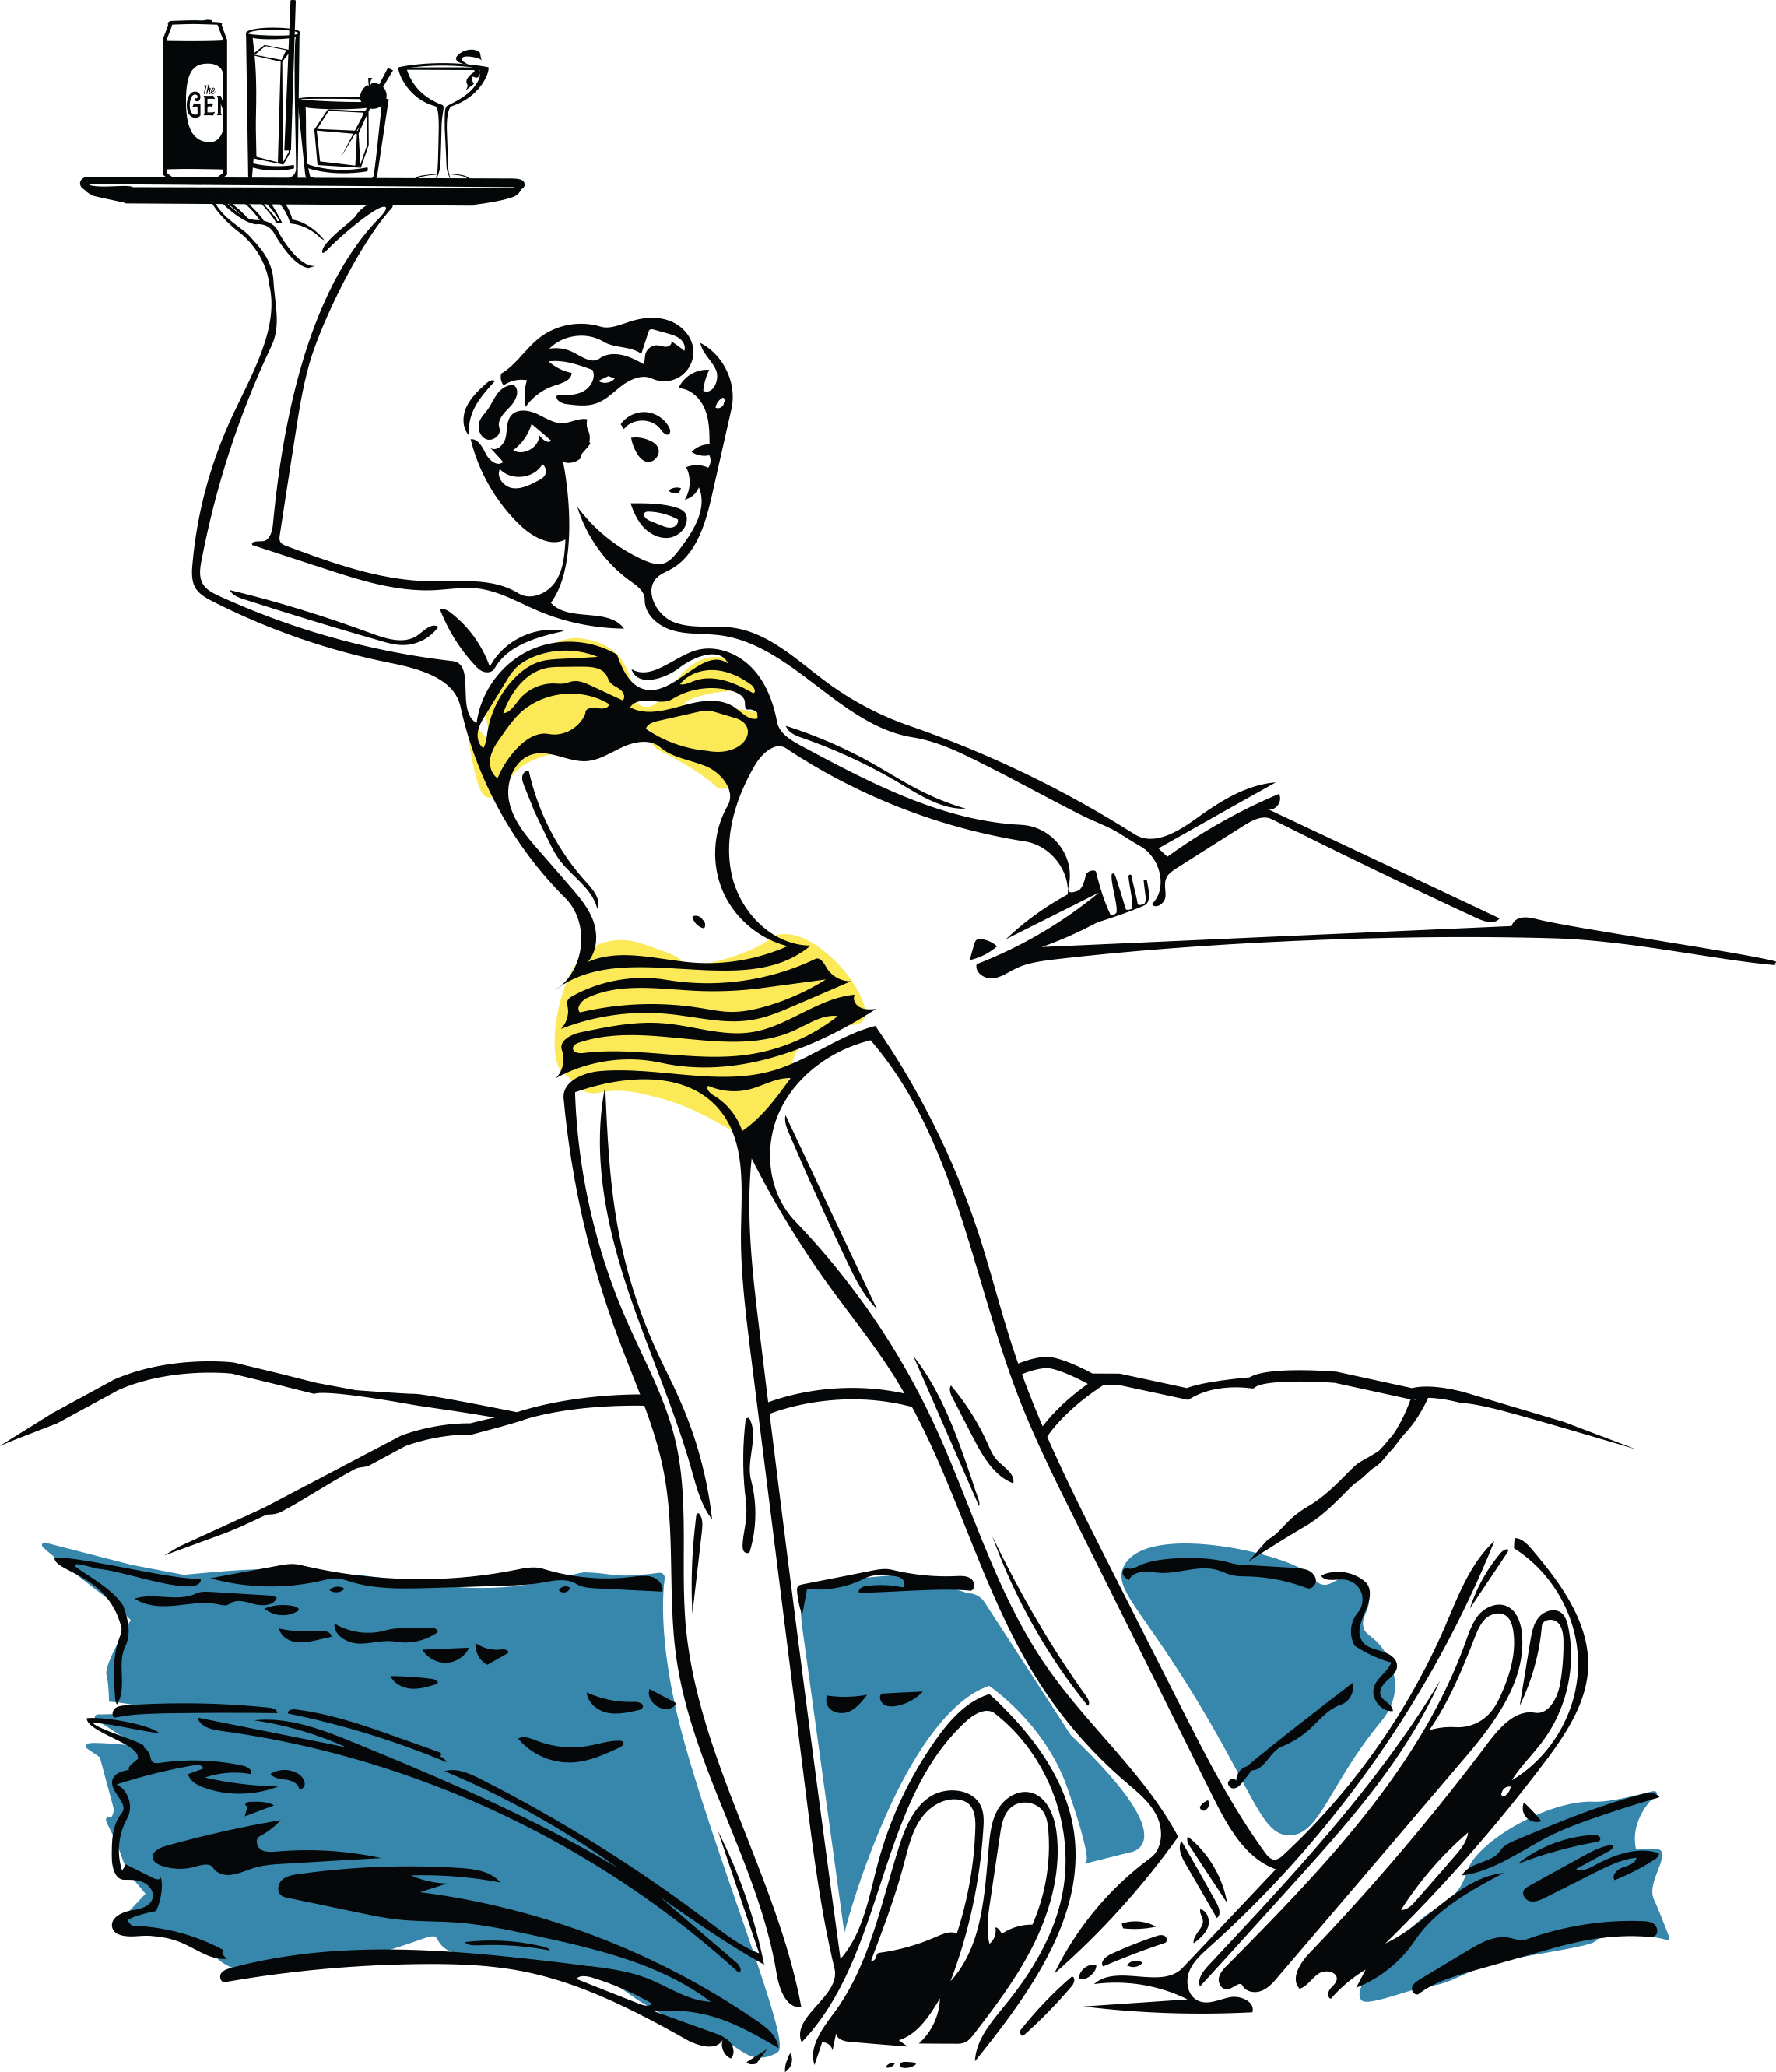 The Gem water skier illustration